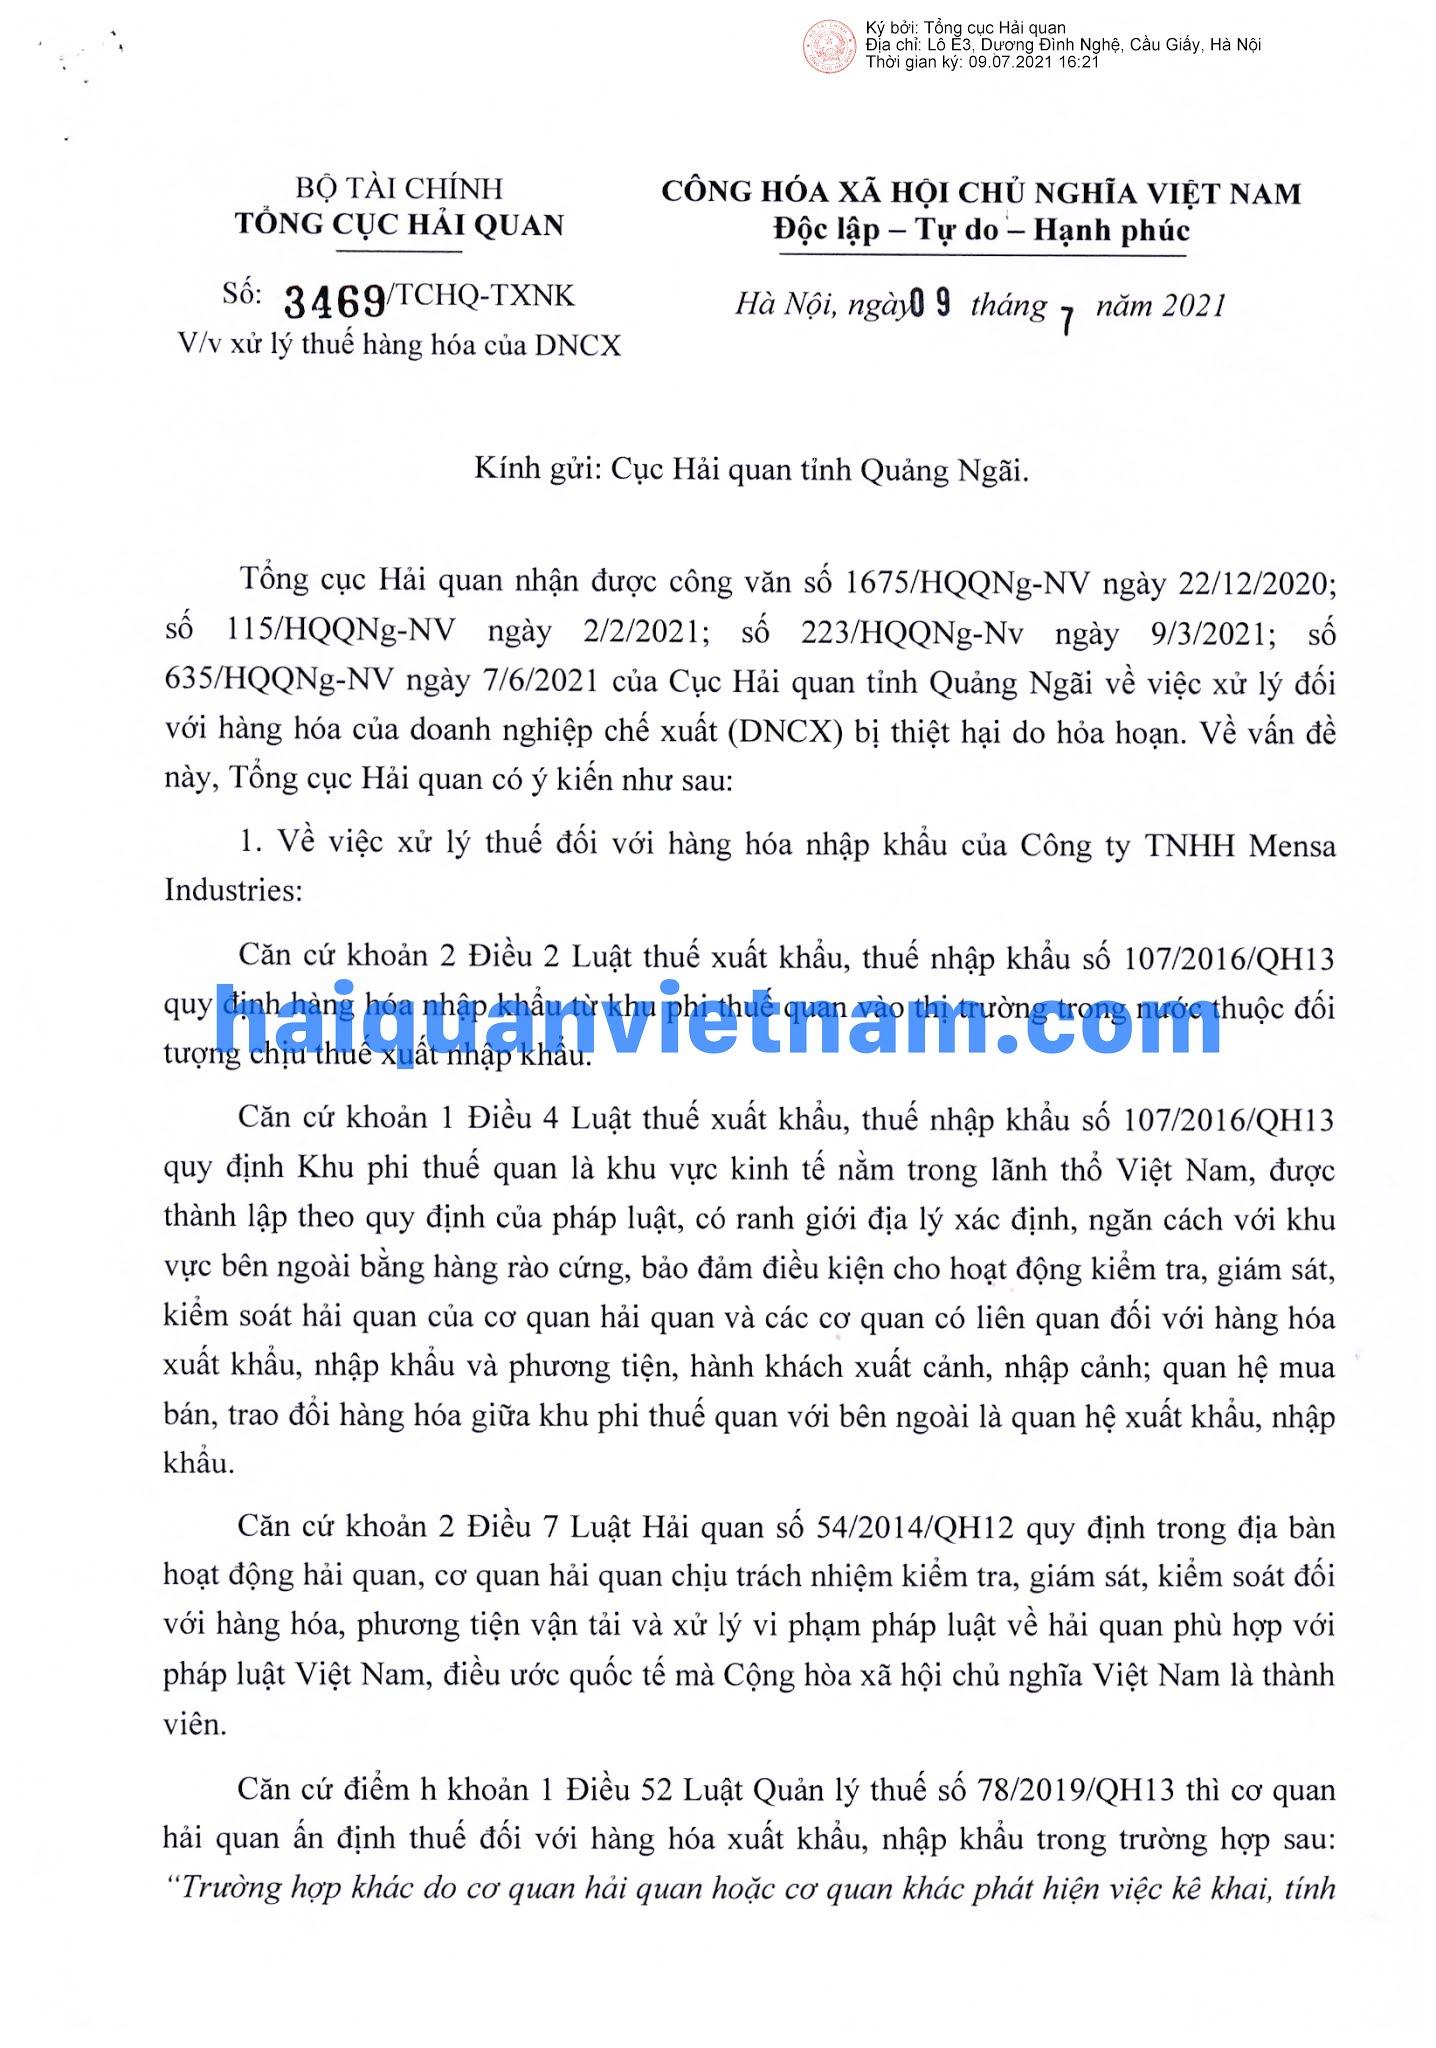 [Image: 210709-3469-TCHQ-TXNK_haiquanvietnam_01.jpg]